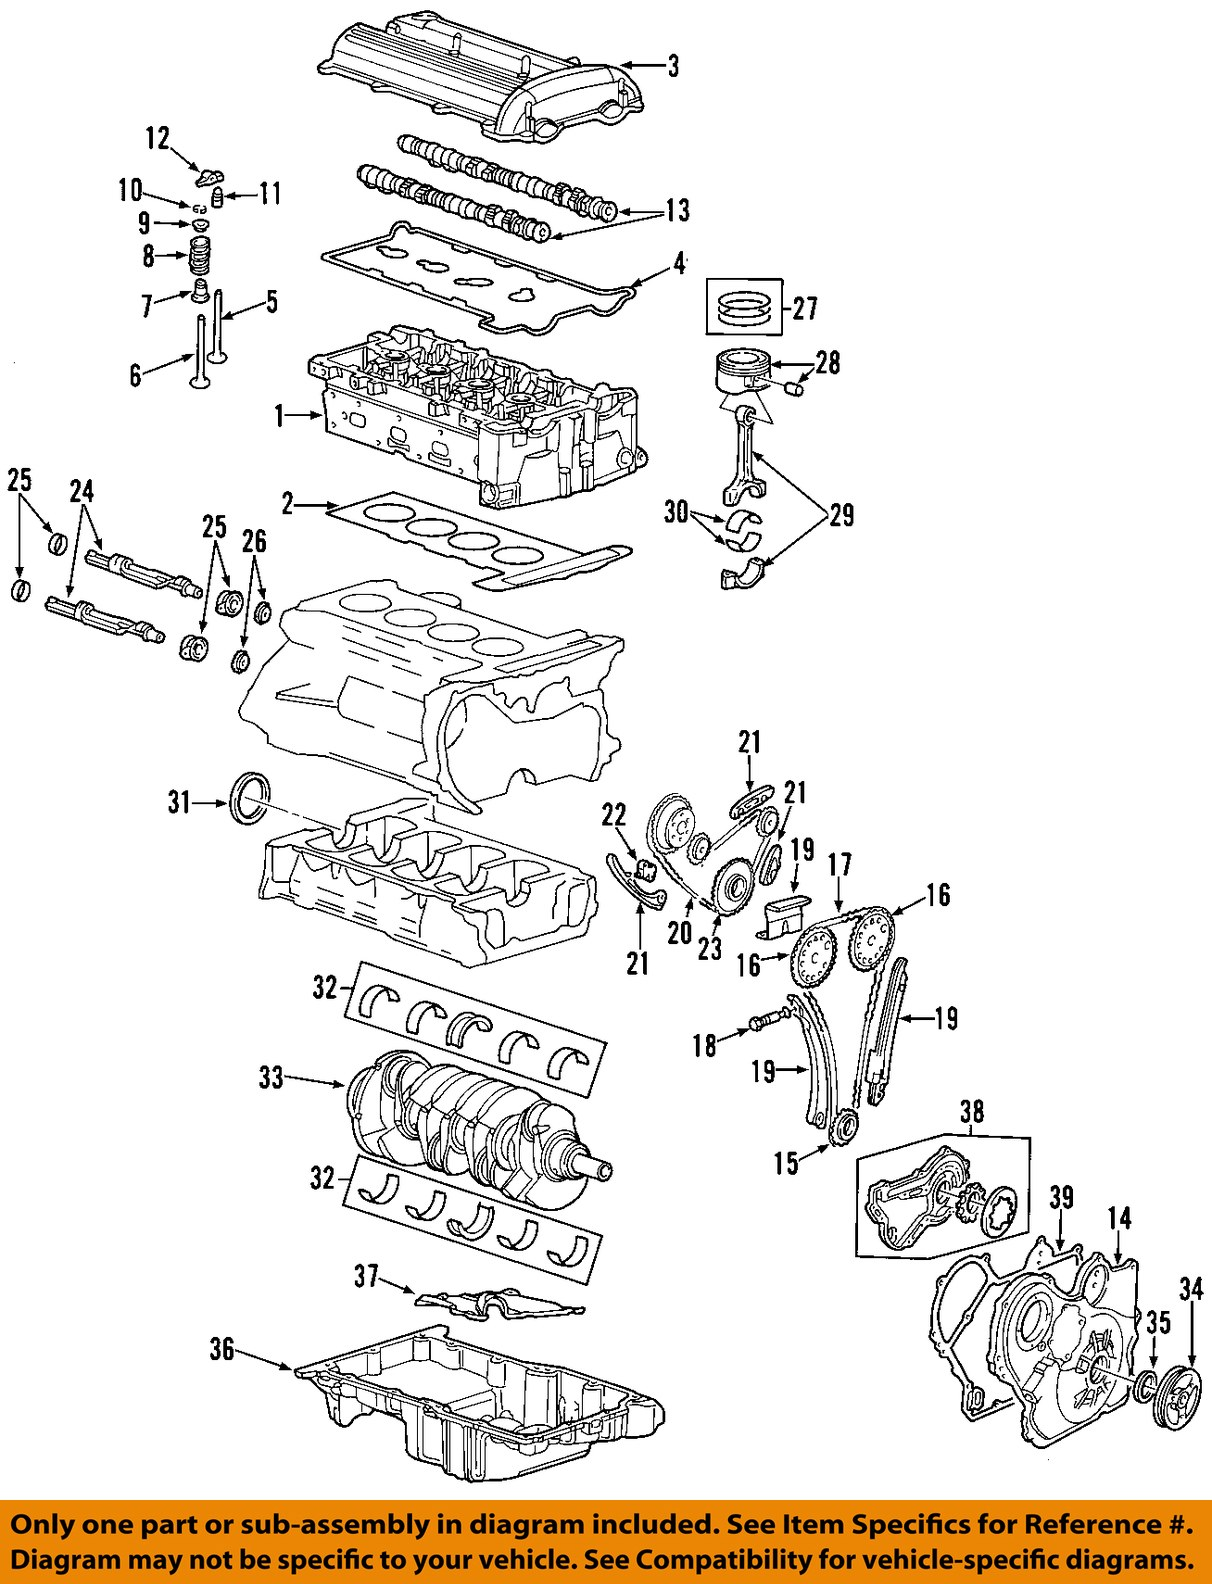 2004 chevy cavalier engine diagram things fall apart plot intake valve actuator cobalt malibu hhr new gm 12578515 ebay